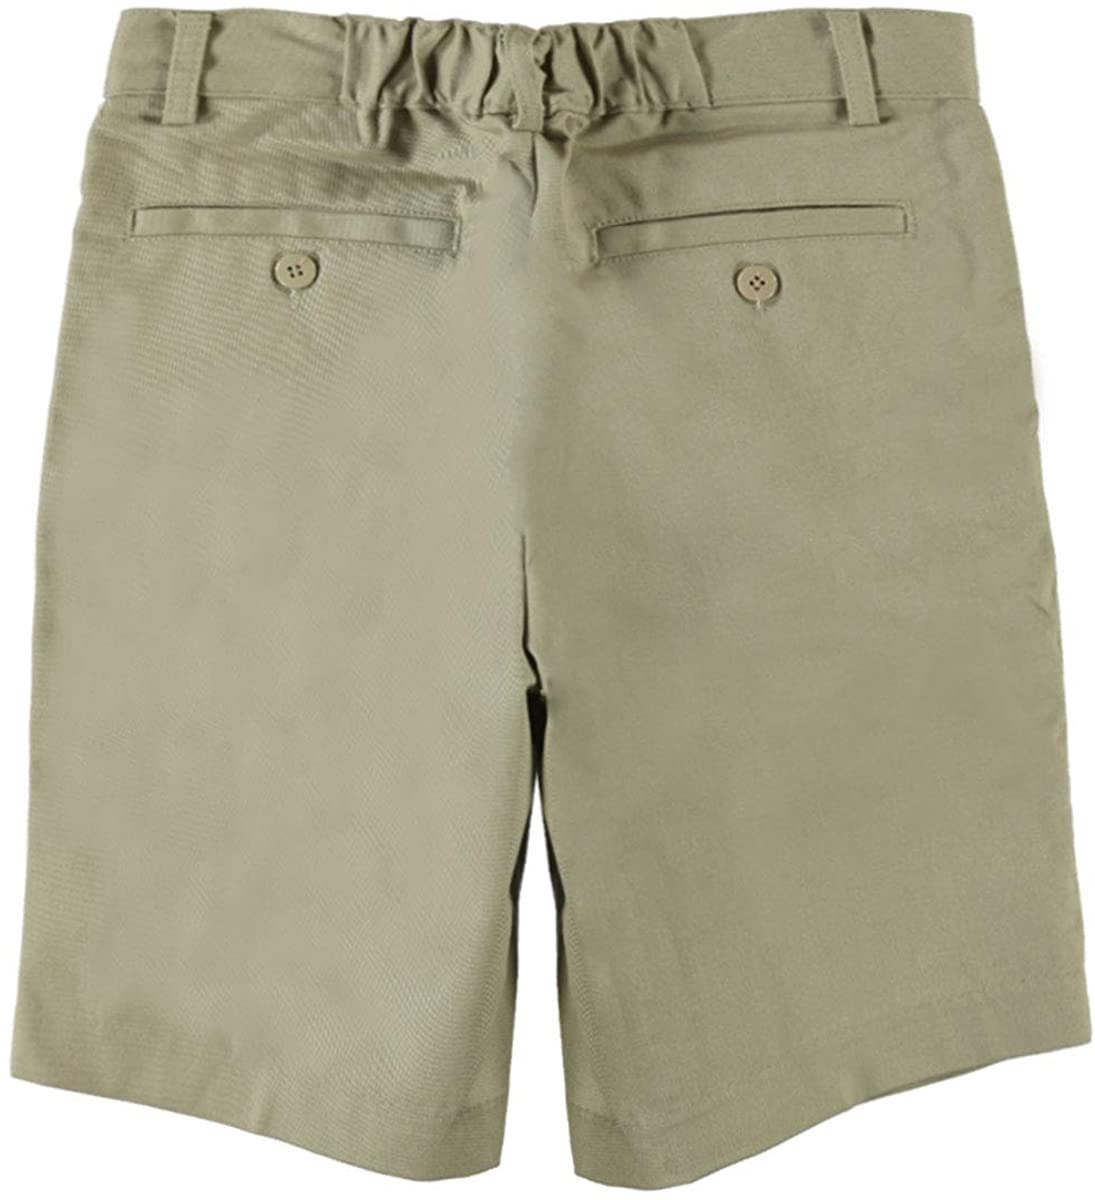 Universal Big Boys' Pleated Front Shorts w/Hook and Eye Closure Schoo- SKU Khaki